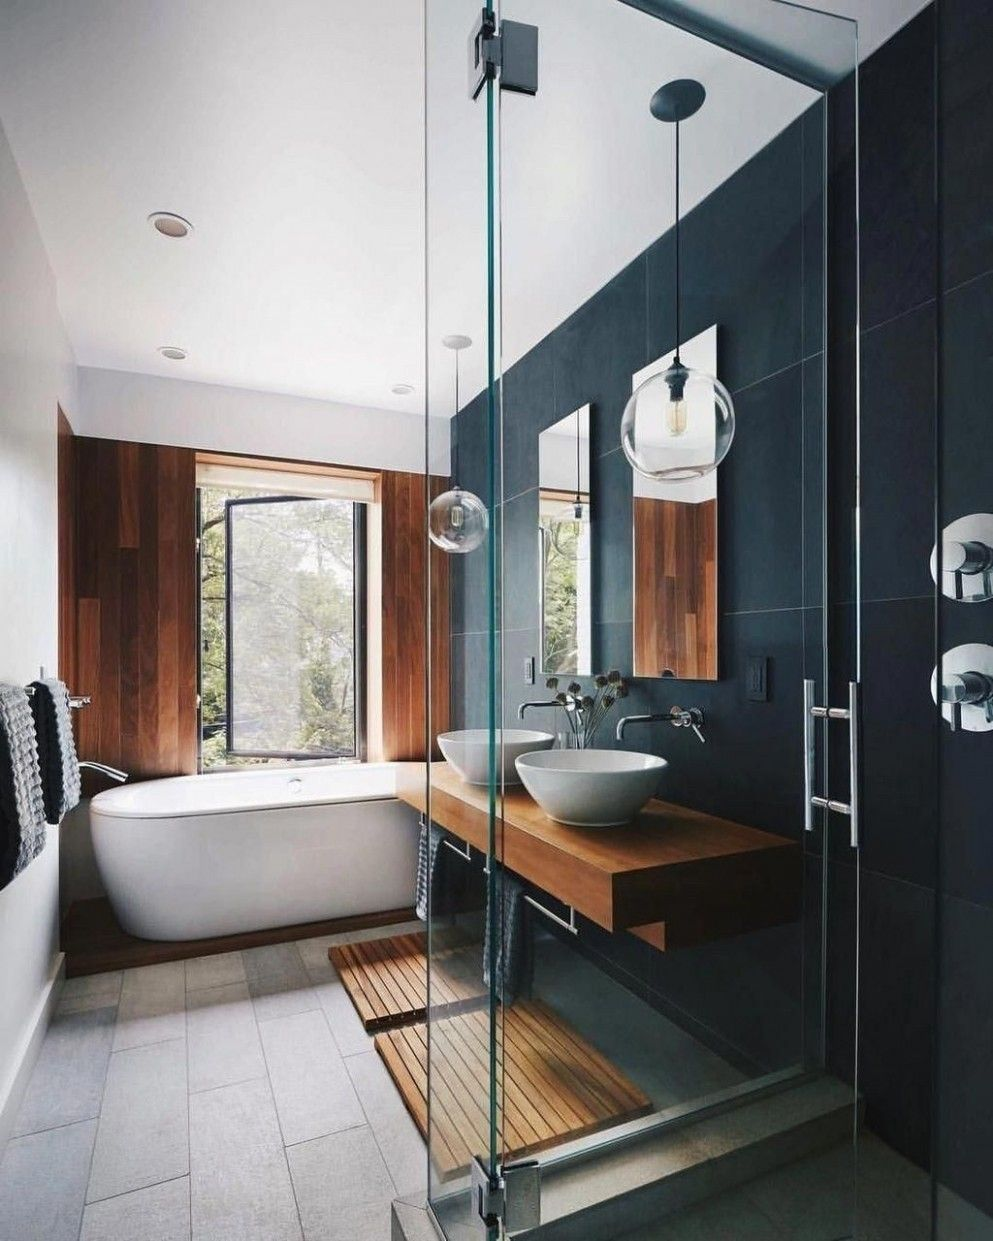 Bathroom Floor Design Jobs Desain Kamar Mandi Kamar Mandi Ide Kamar Mandi New concept colonial home bathroom